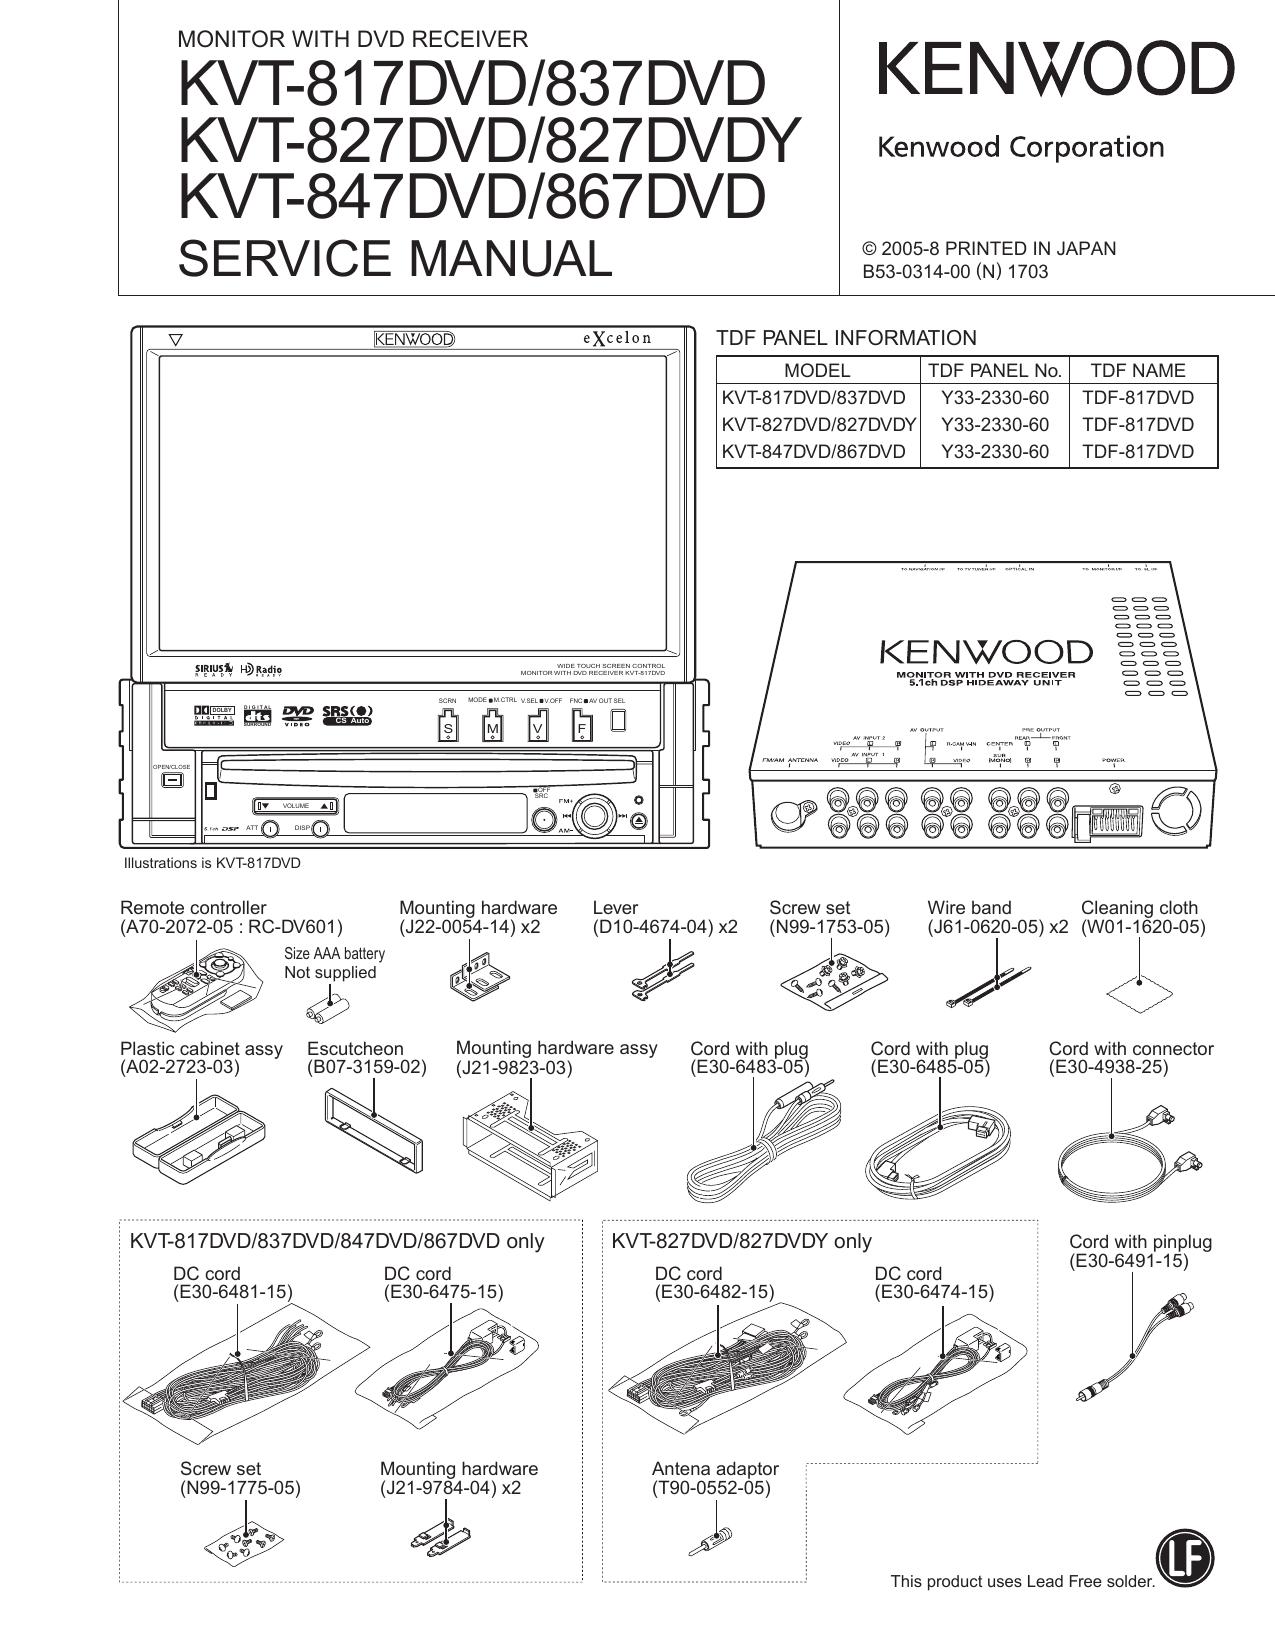 KVT-817DVD/837DVD KVT-827DVD/827DVDY KVT   manualzz.com on